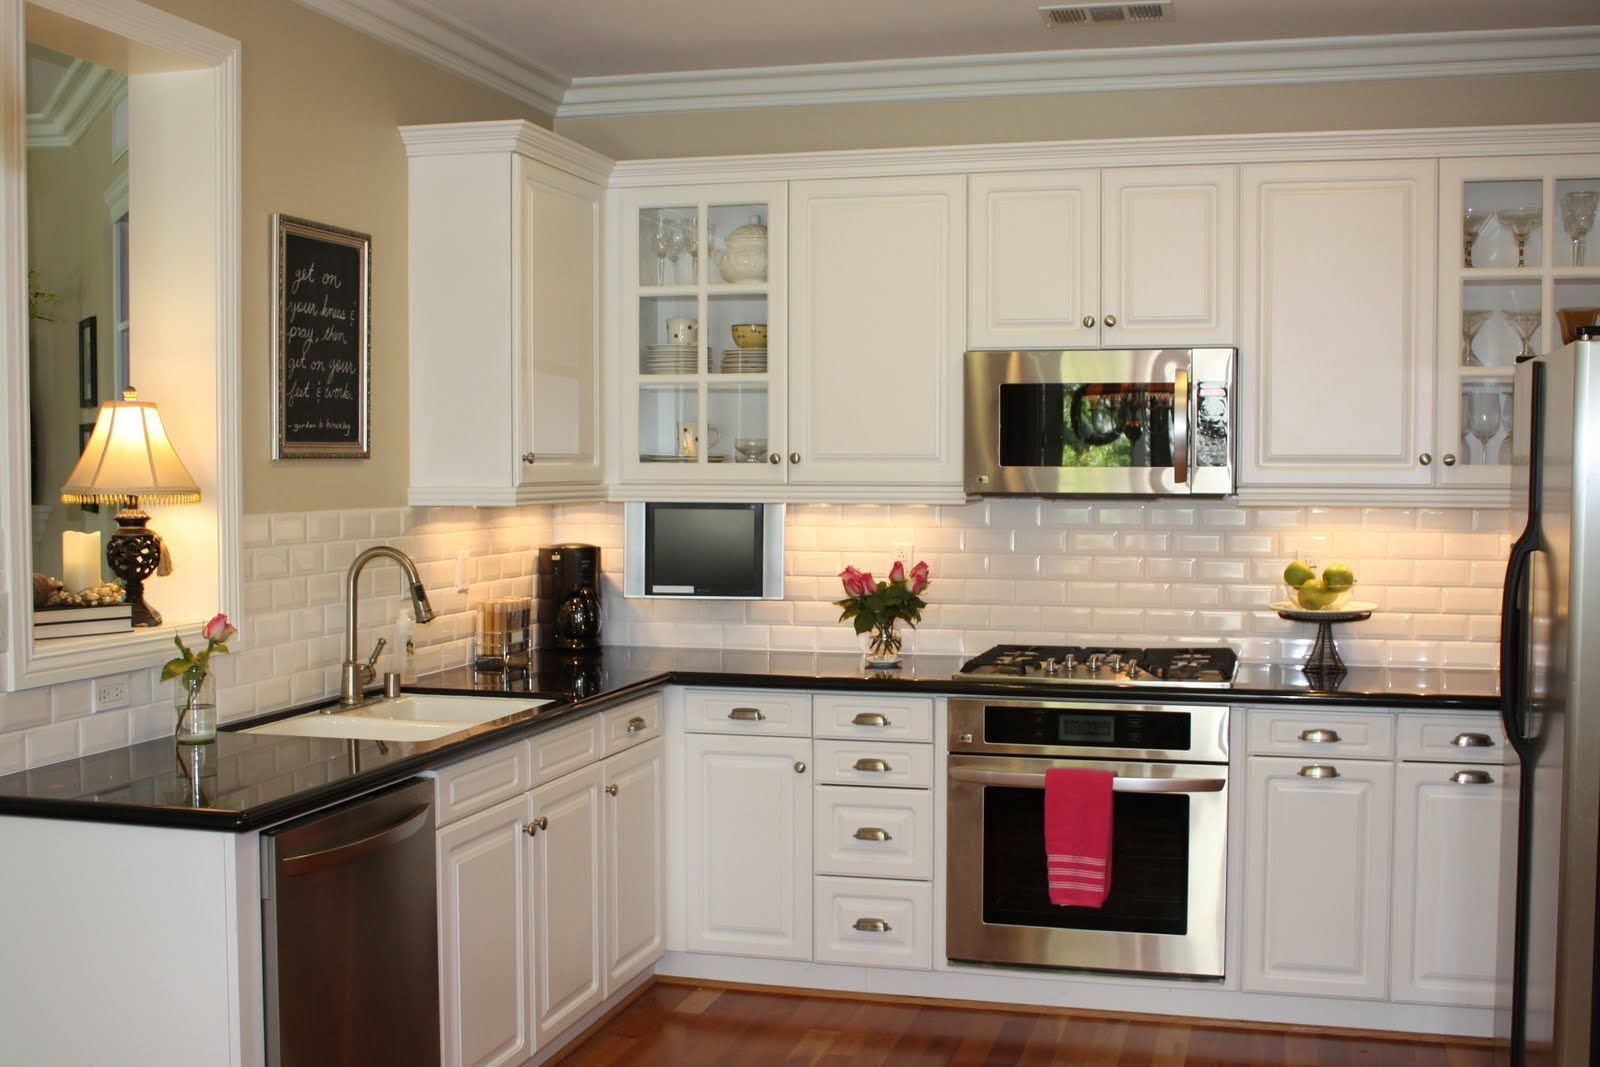 Family Room U0026 Kitchen Open Floor Plan. White Kitchen Cabinets. White Subway  Tile. Dark Wood Floors. | 2 Living/Family/Great Rooms | Pinterest | White  Subway ...